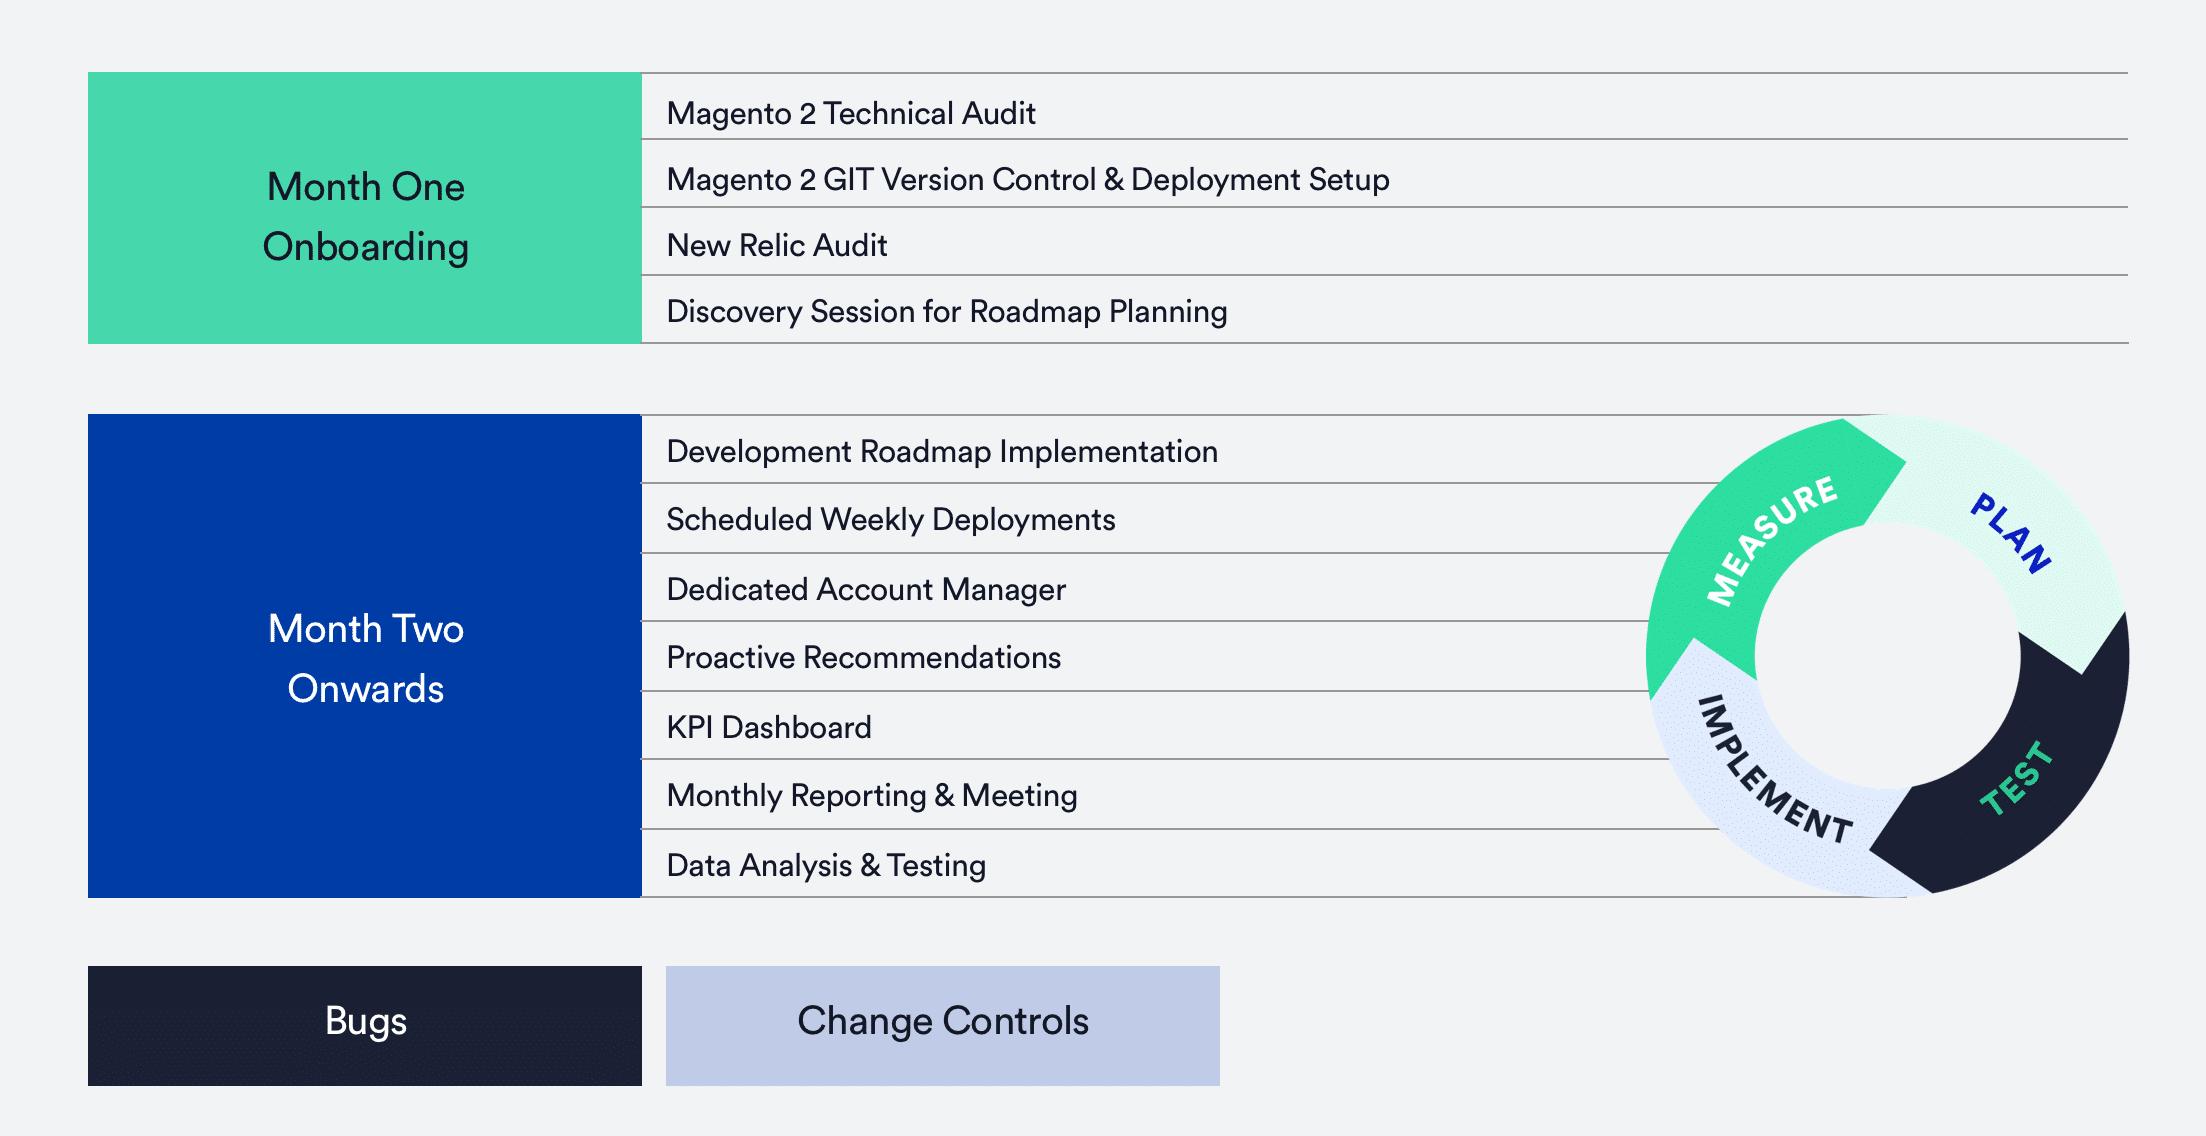 Magento 2 Support Timeline